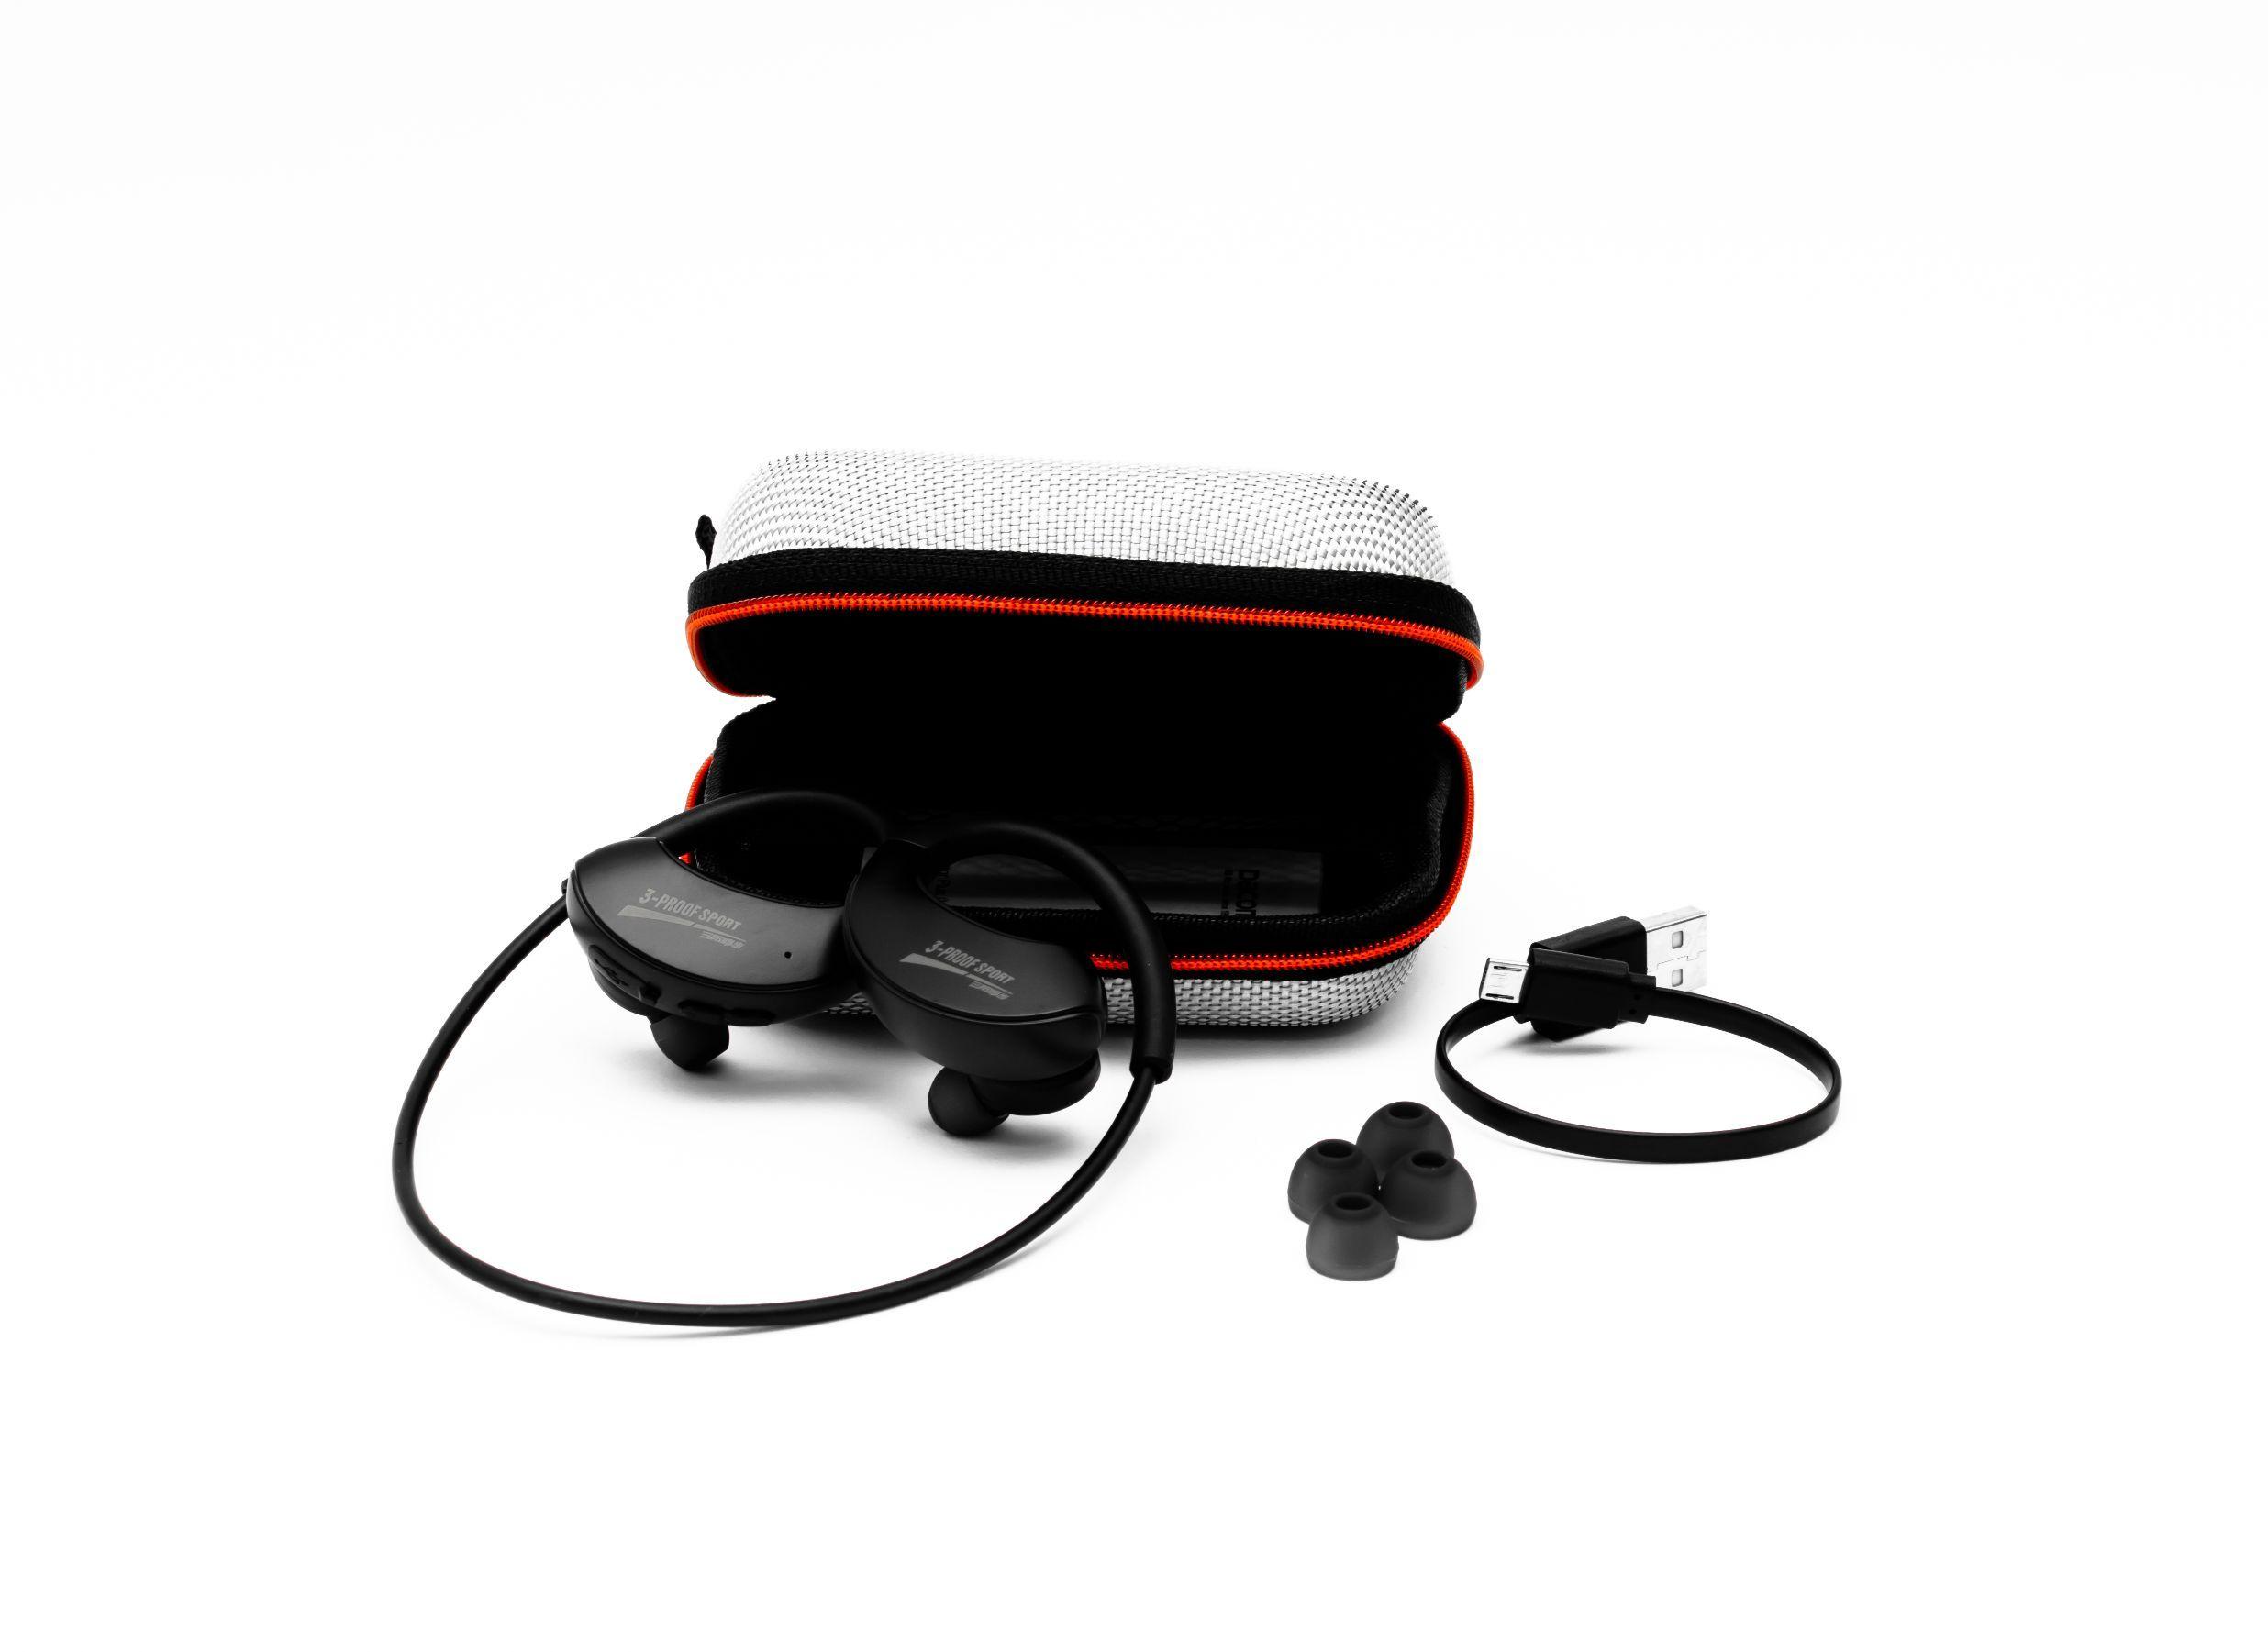 Earphone Dacom L16 Bluetooth Black بسعر 375ج بدل من 450ج Phone Accessories Newsboy